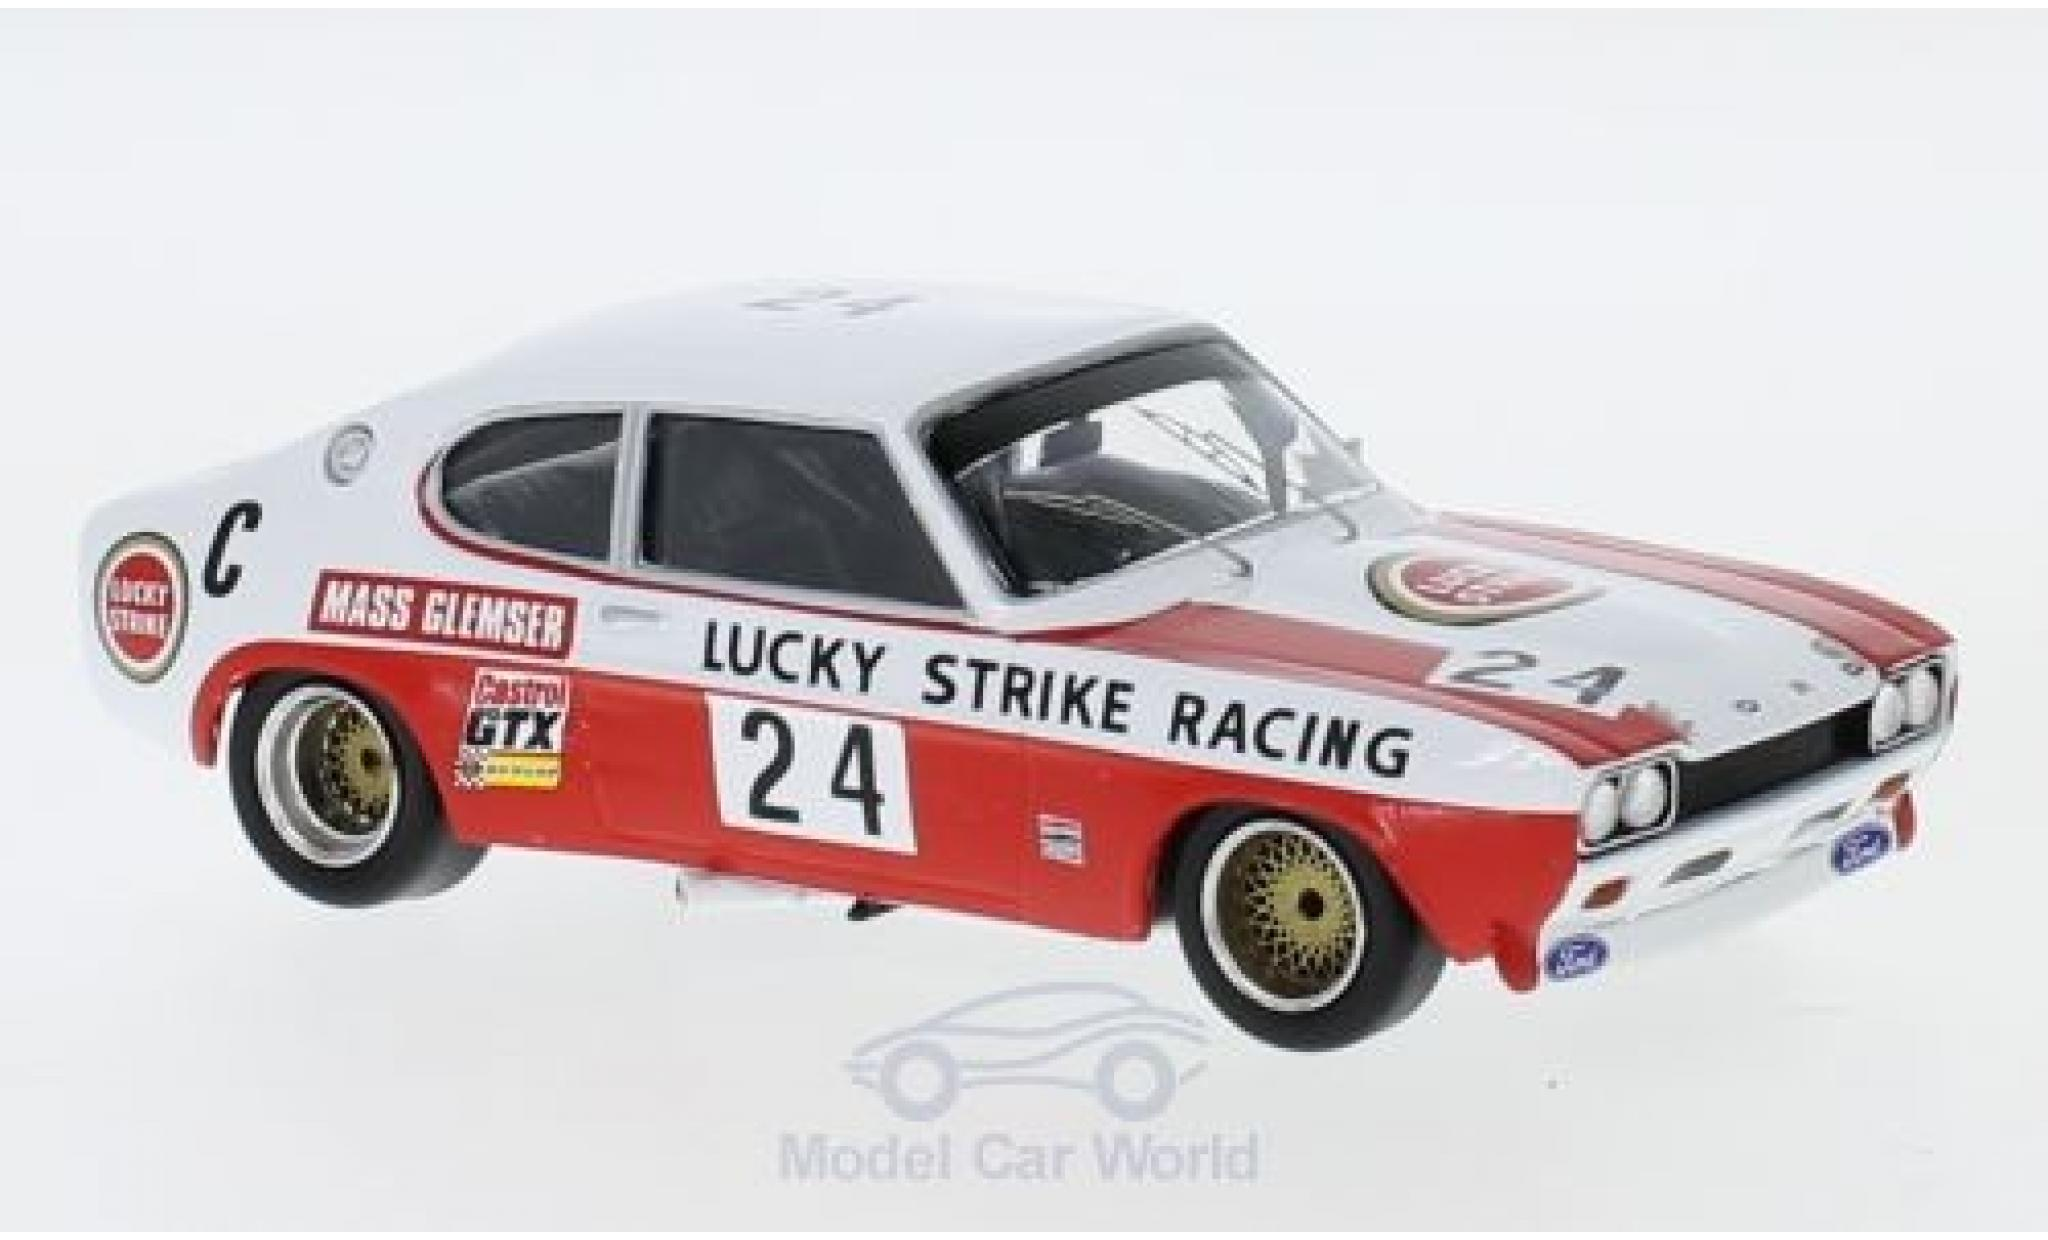 Ford Capri 2600 1/43 Trofeu MK I RS No.24 Lucky Strike Racing Lucky Strike 9h Kyalami 1971 J.Mass/D.Glemser